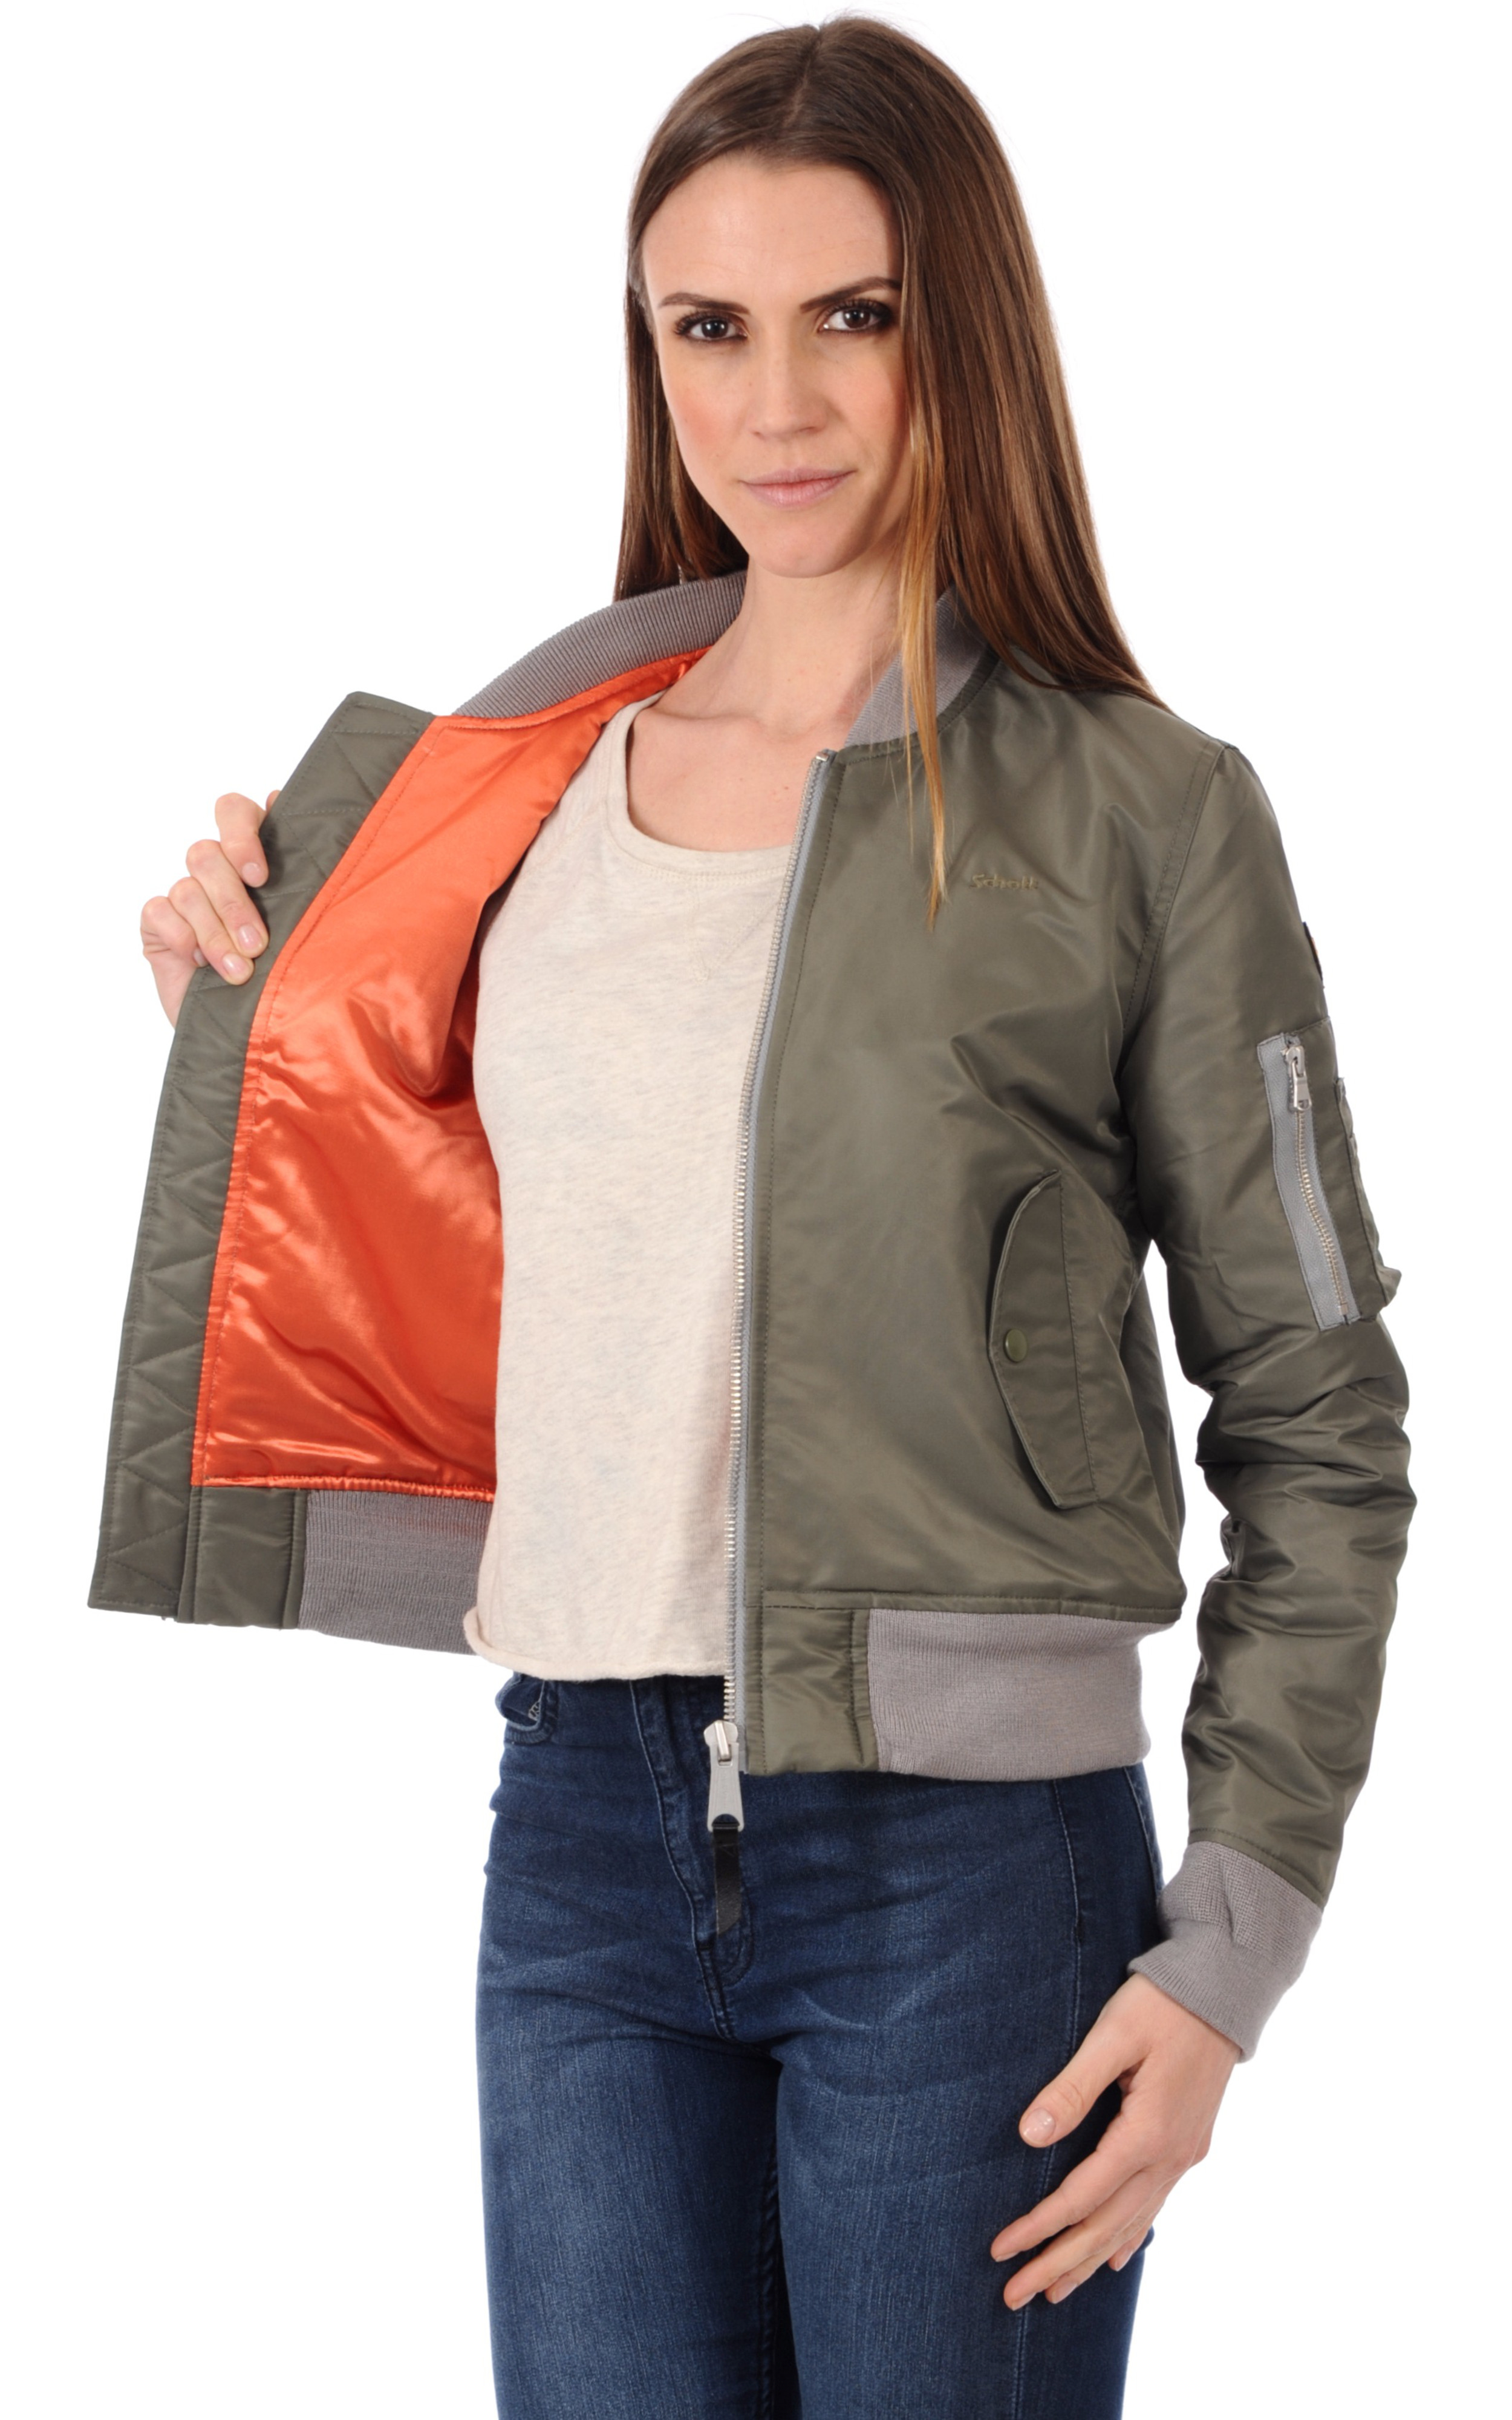 Bomber Femme JKT AC W Kaki Schott - La Canadienne - Blouson Textile Kaki a2a00b8a351